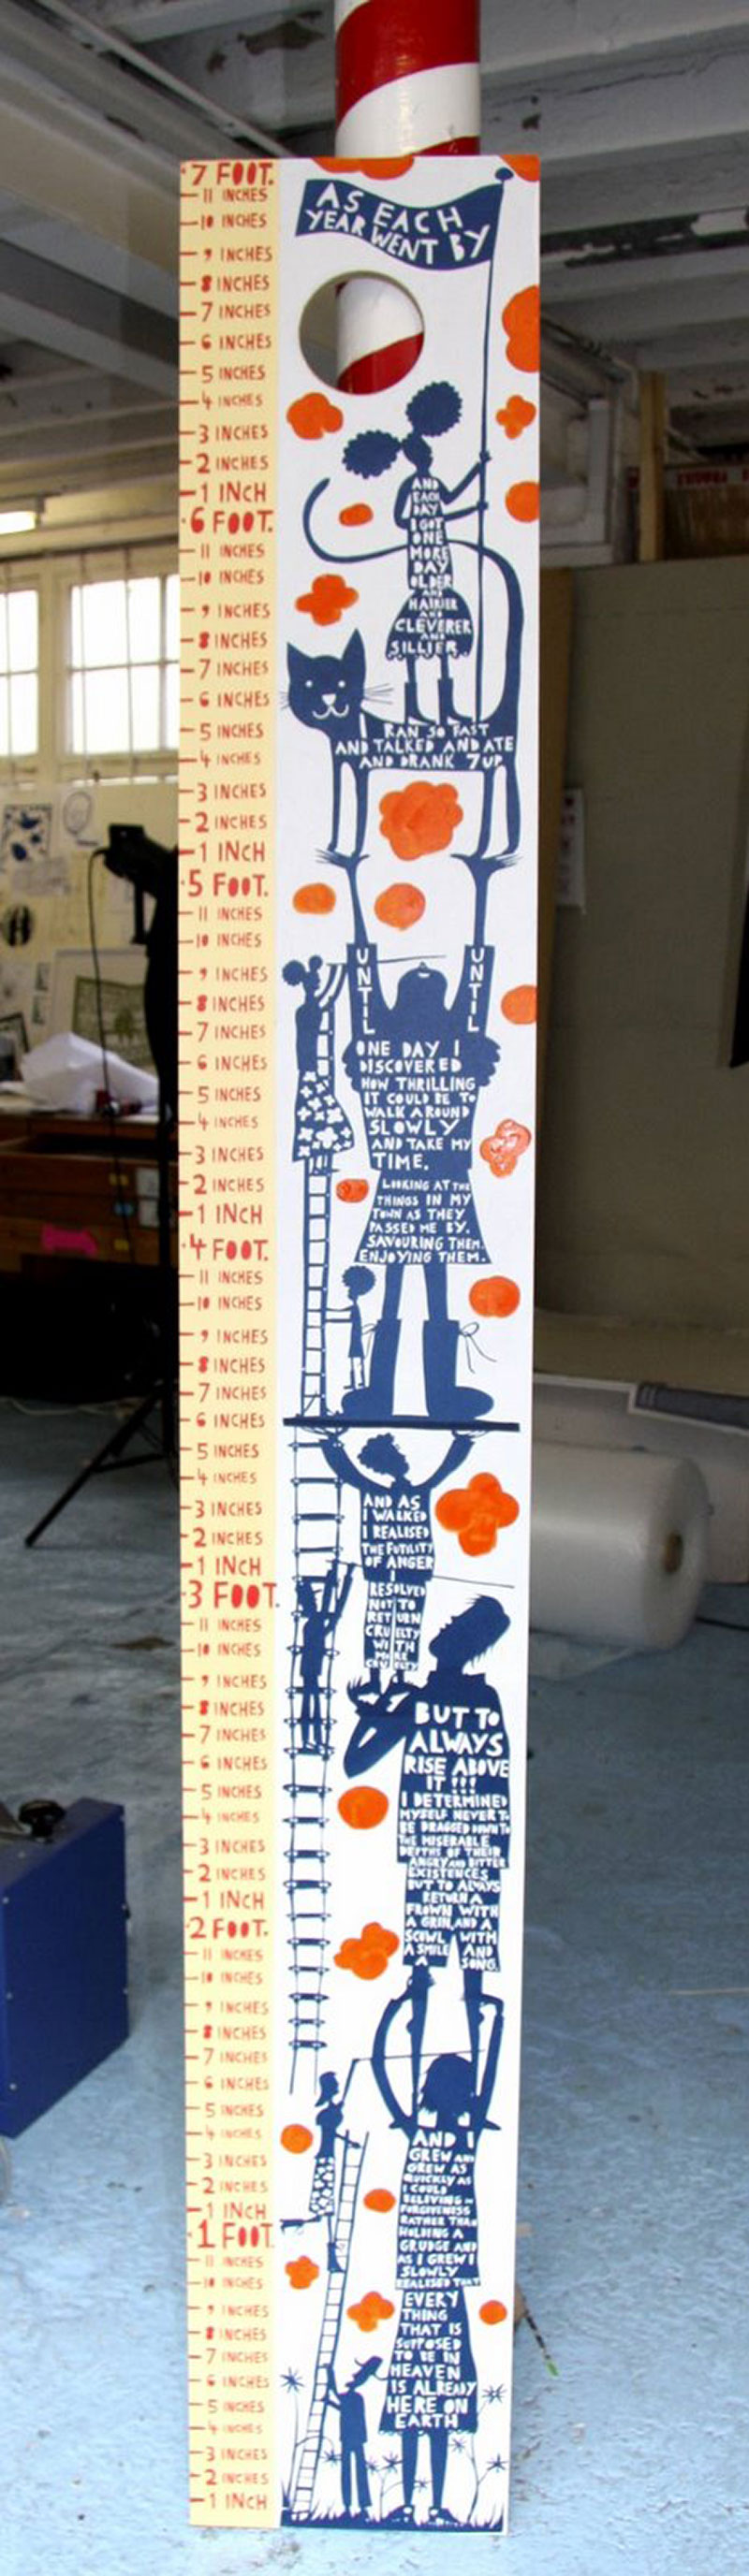 ruler-with-orange